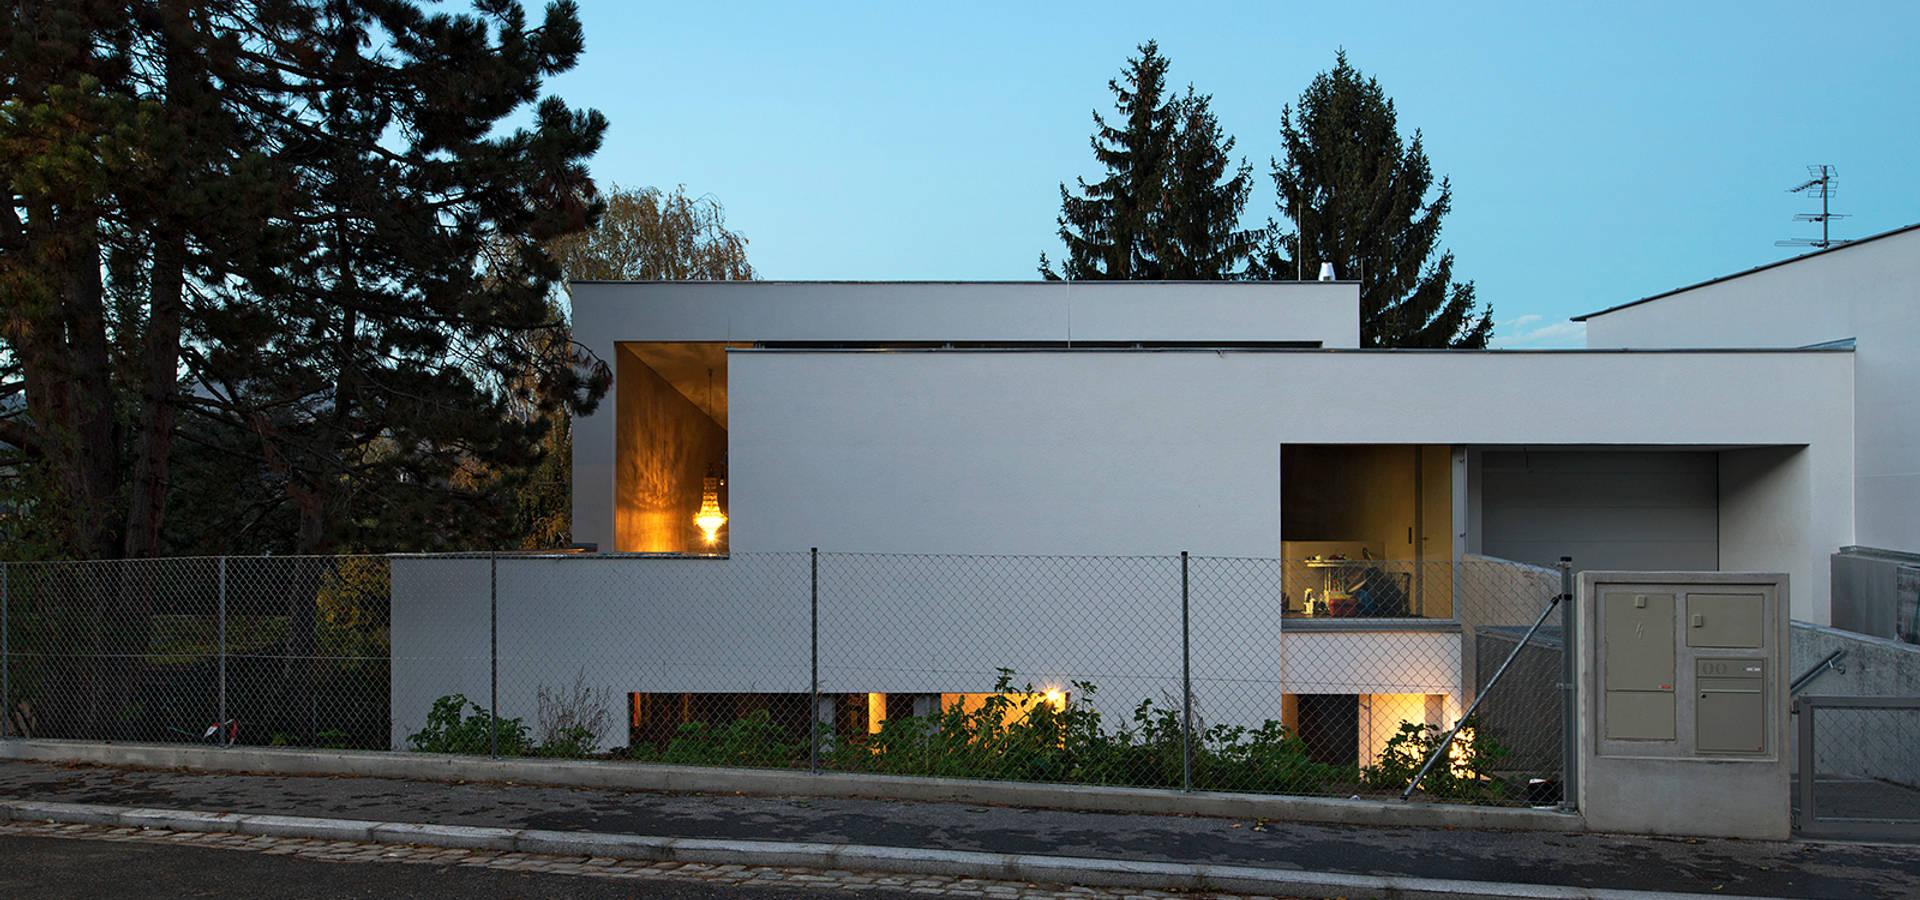 Abendroth Architekten